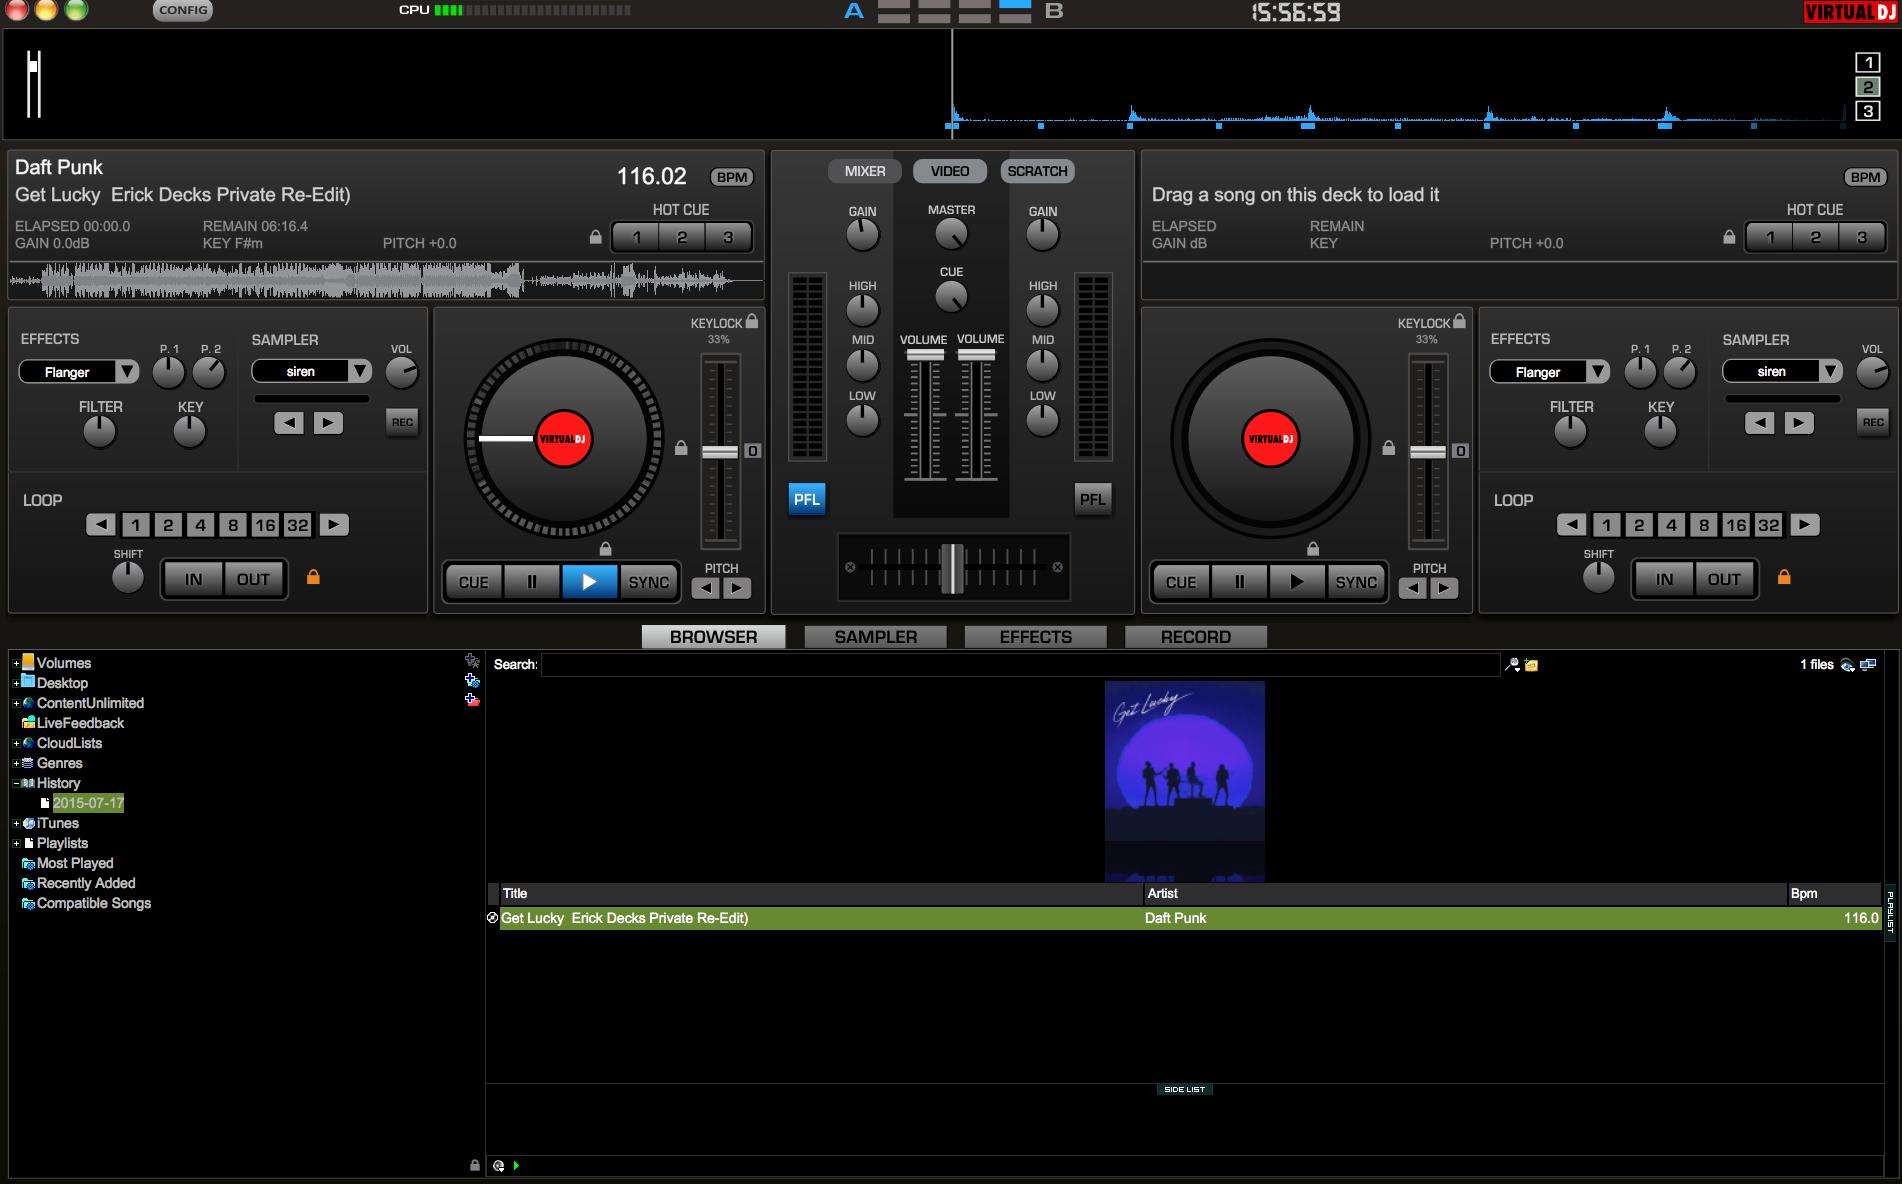 Virtual DJ Pro 7 dashboard.